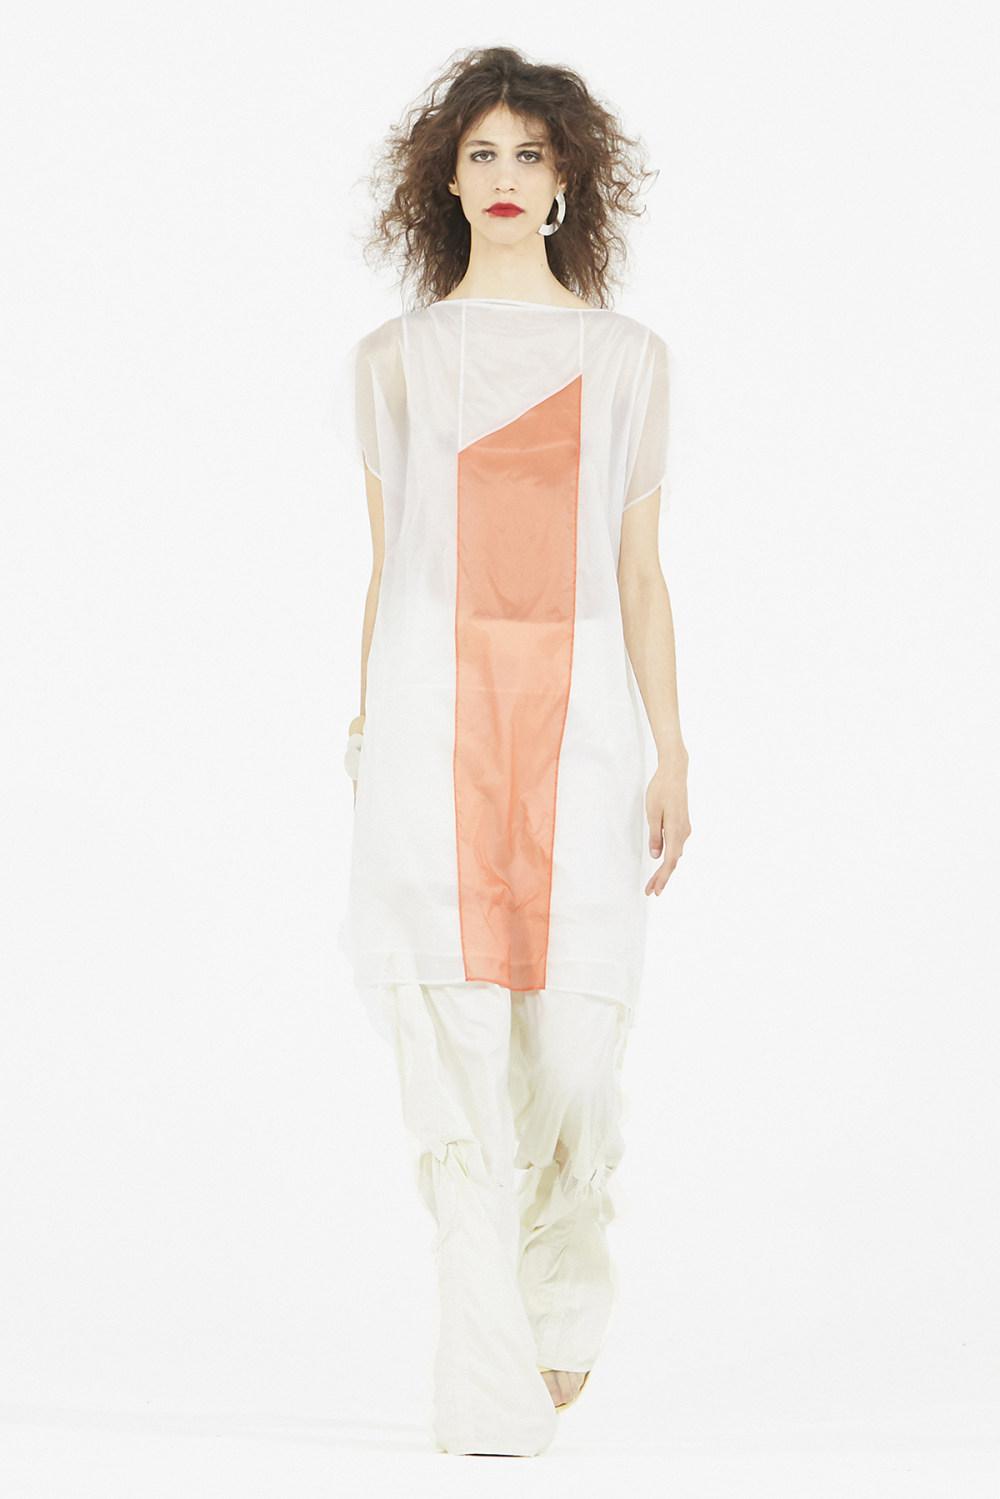 Nicolas Andreas Taralis时装系列技术织物矩形条纹被缝合在一起-5.jpg